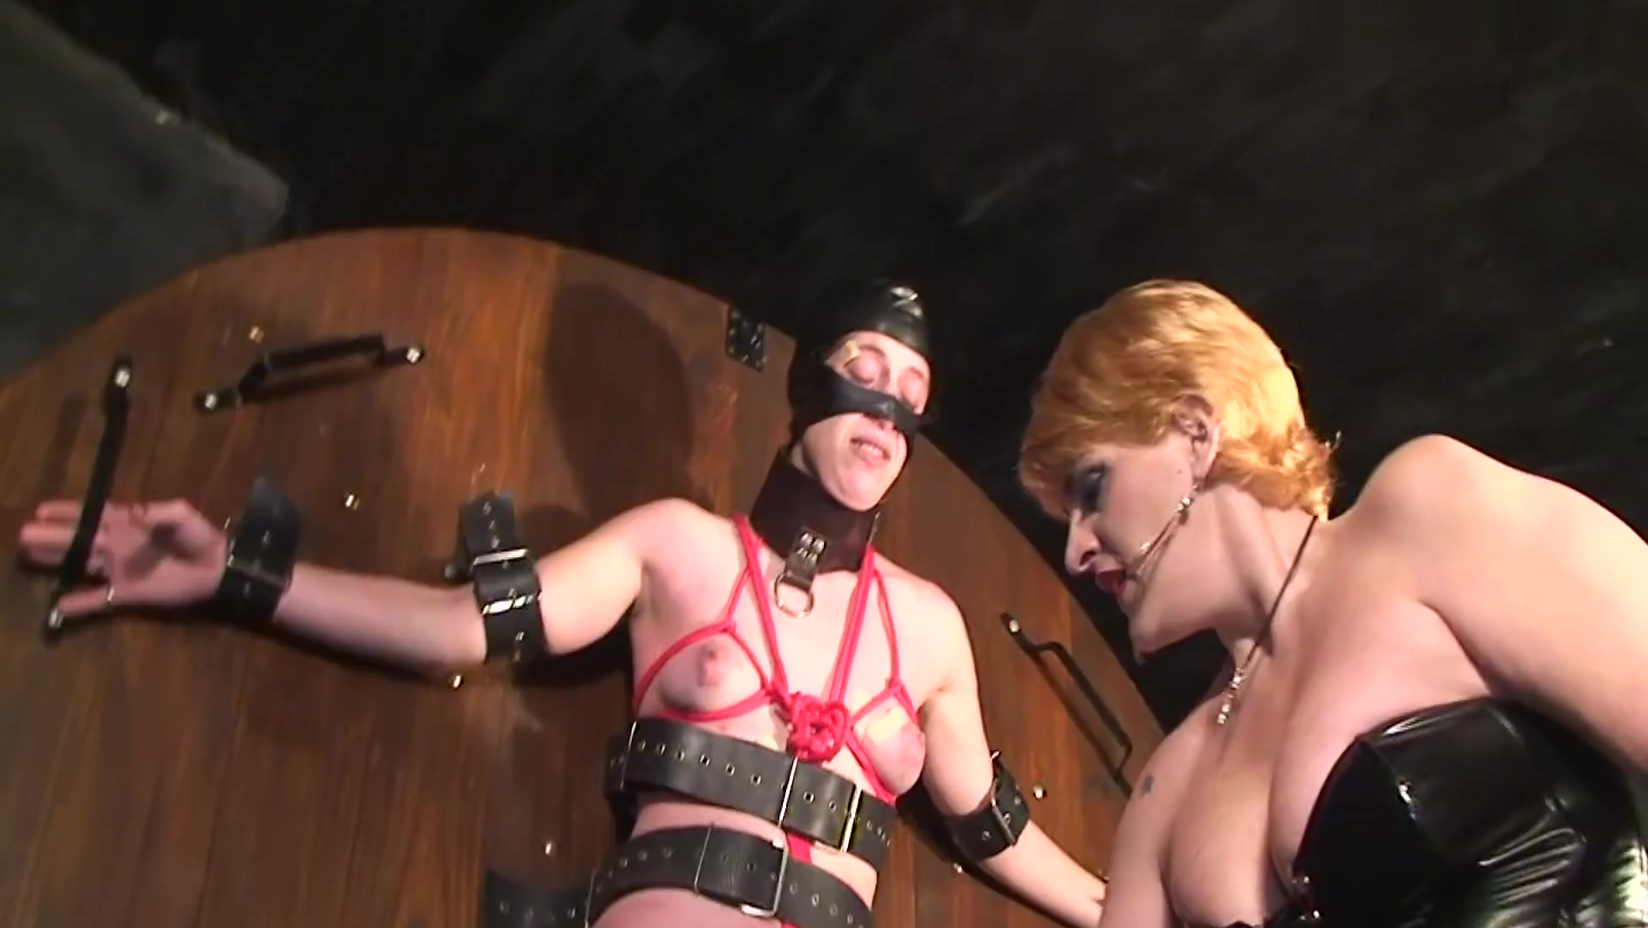 Mistress Karina & Mistress Marta Dom Slave Painslut Femdom Bondage Clothespin